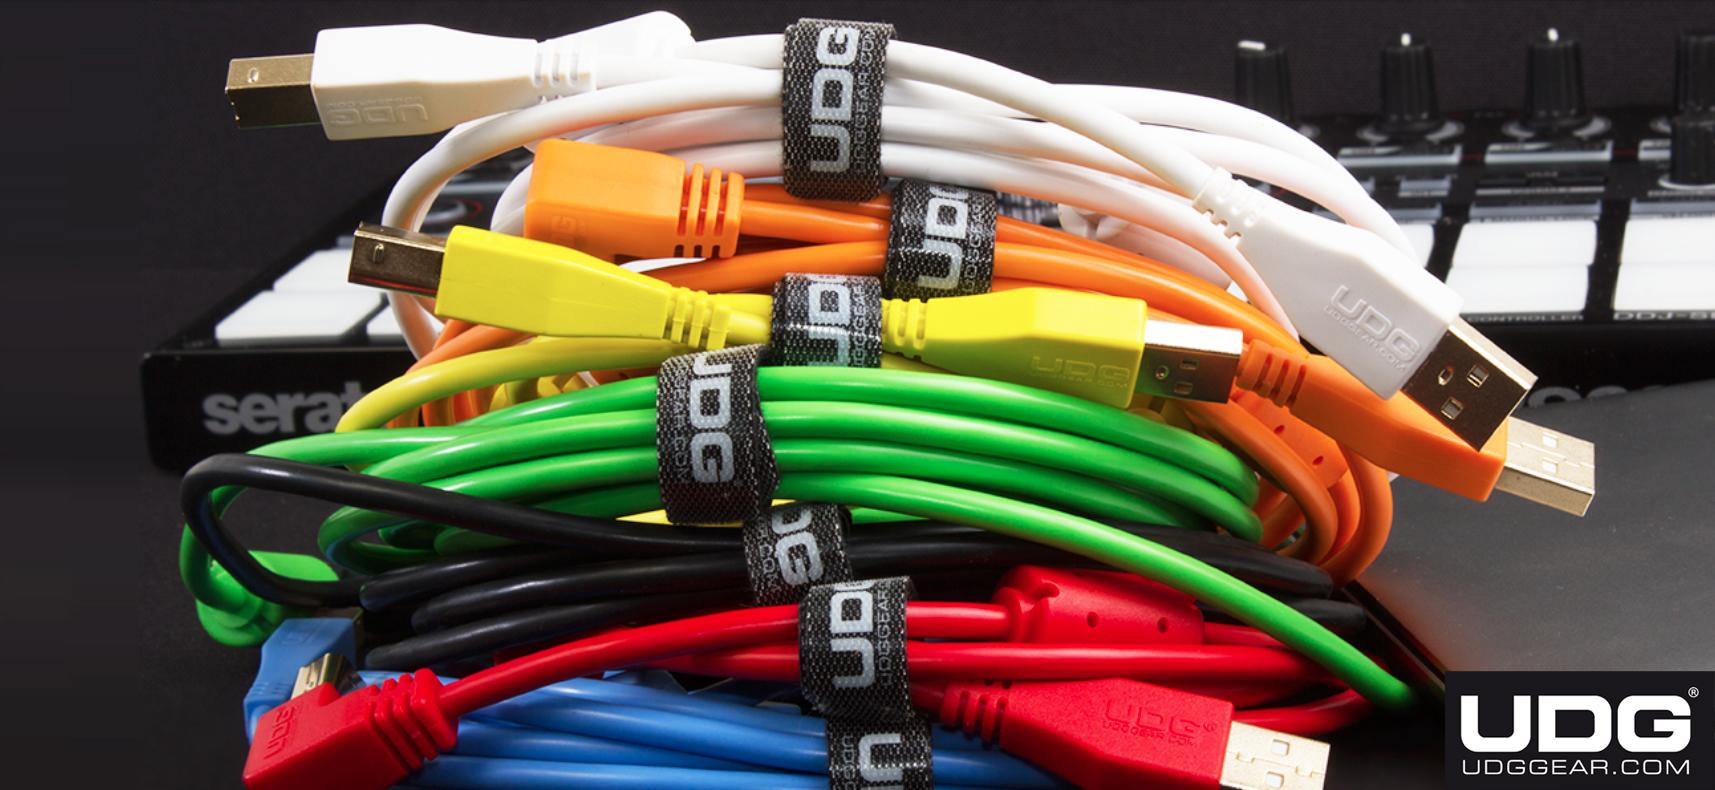 UDG Gear lanserar professionella USB-kablar